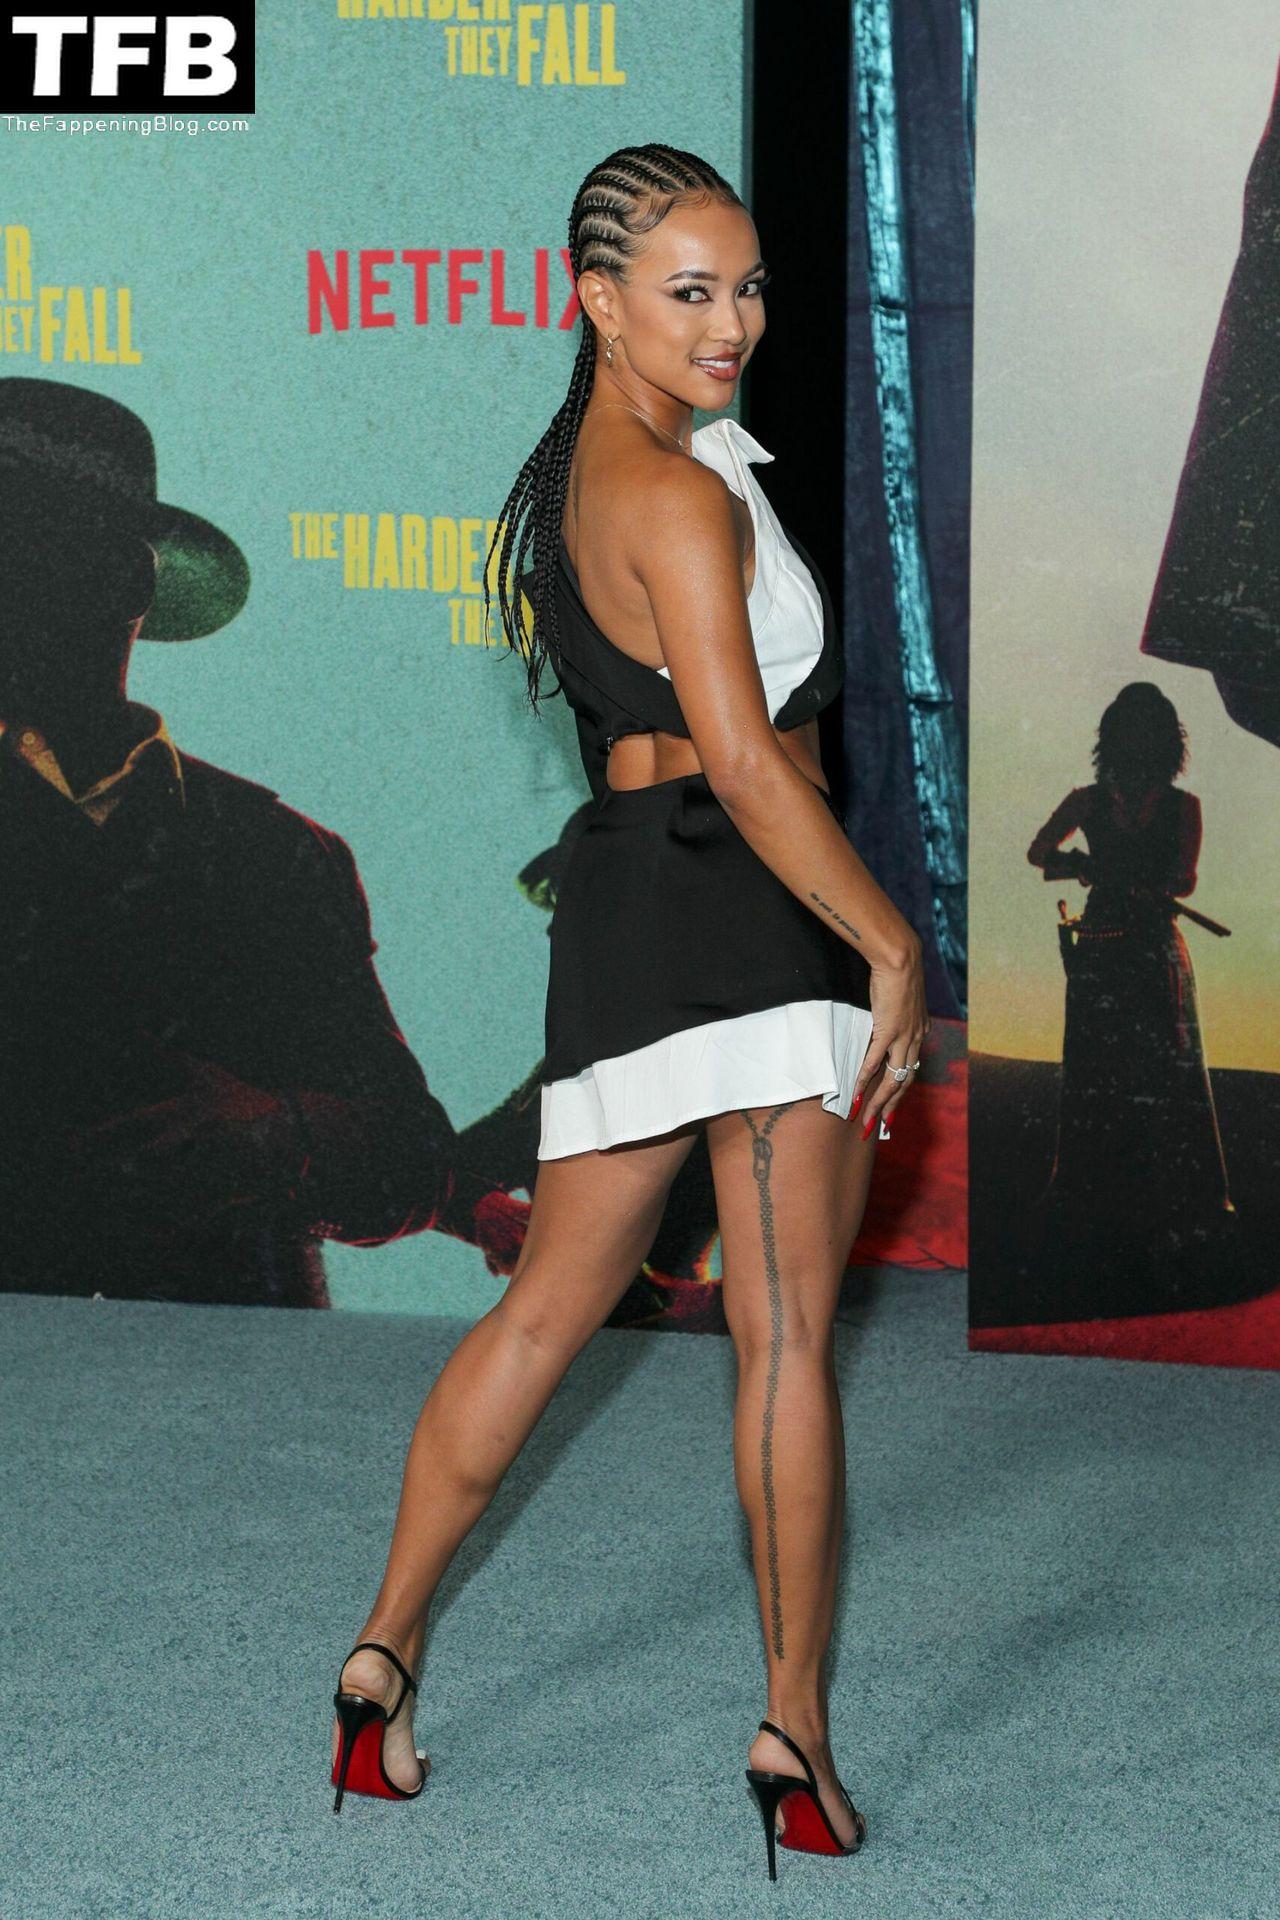 Karrueche-Tran-Sexy-Legs-Upskirt-The-Fappening-Blog-29.jpg